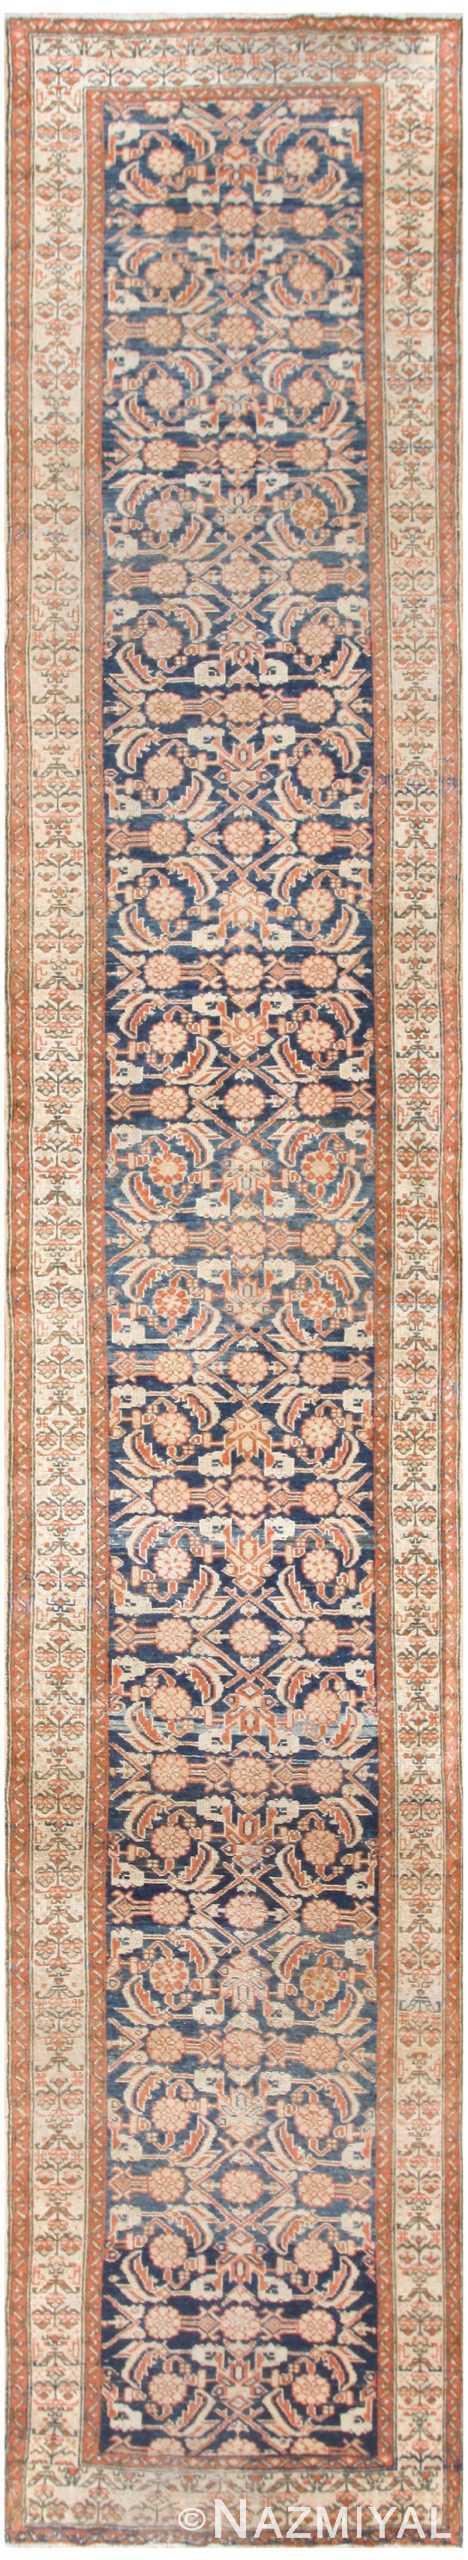 Antique Persian Malayer Runner 50174 Nazmiyal